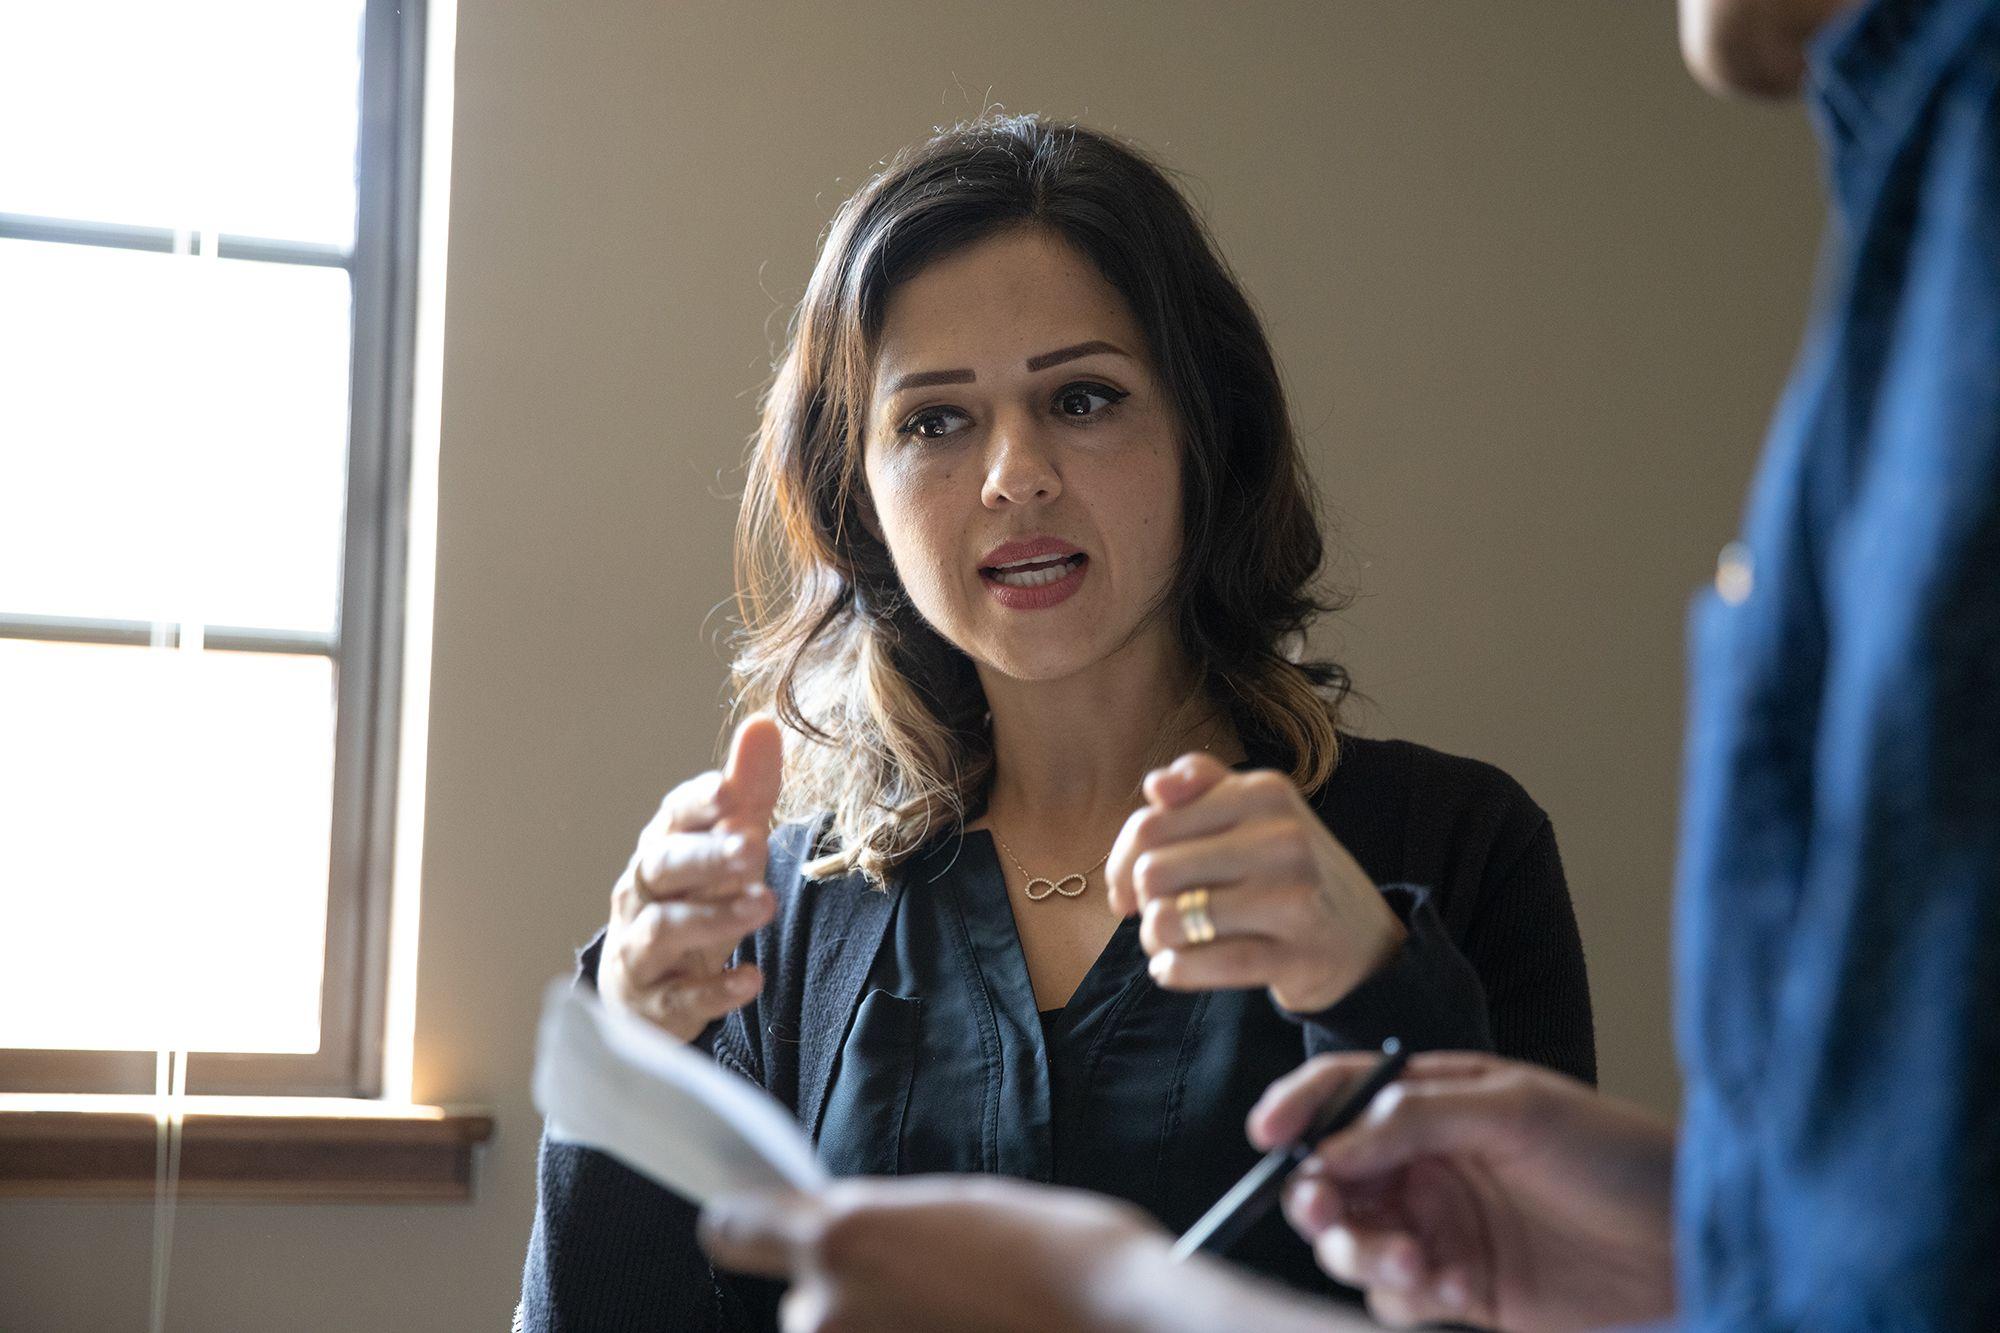 An international business college professor seaking to her class.